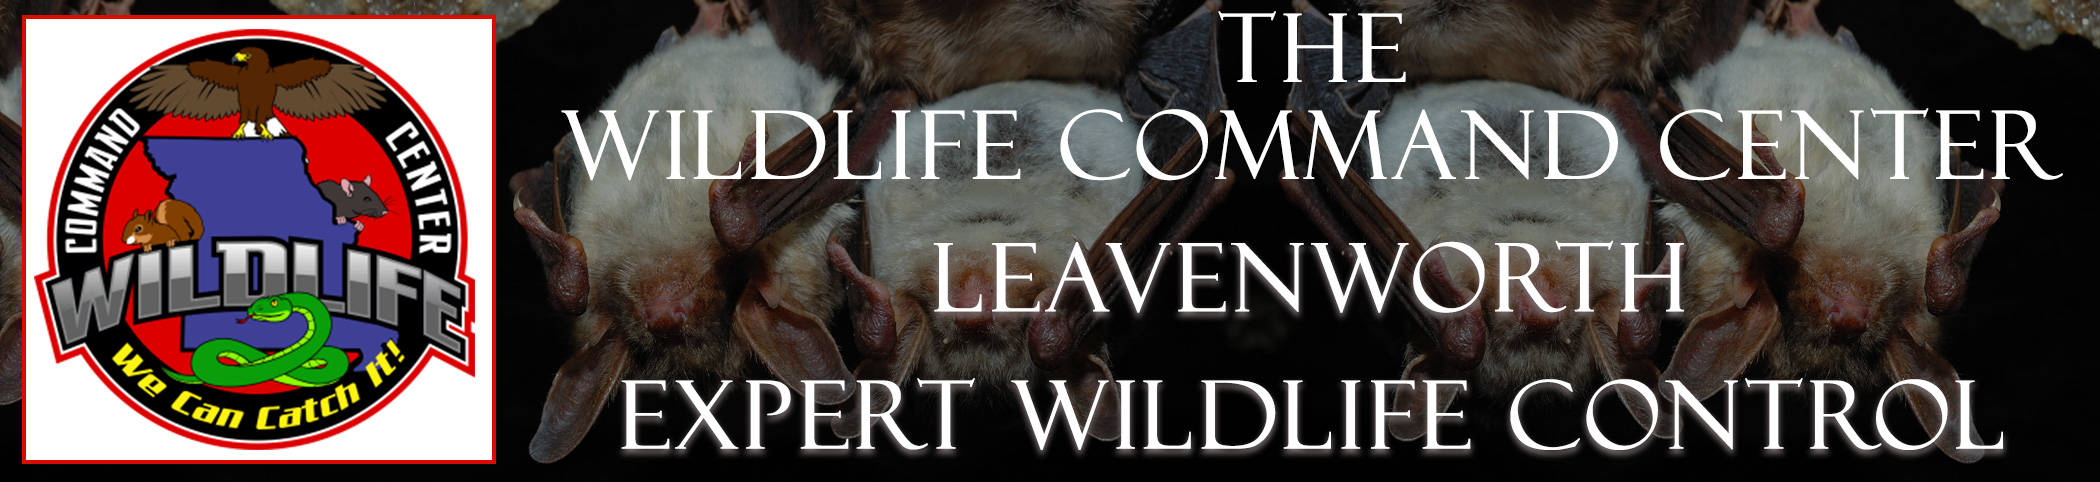 The Wildlife Command Center Leavenworth Kansas Image